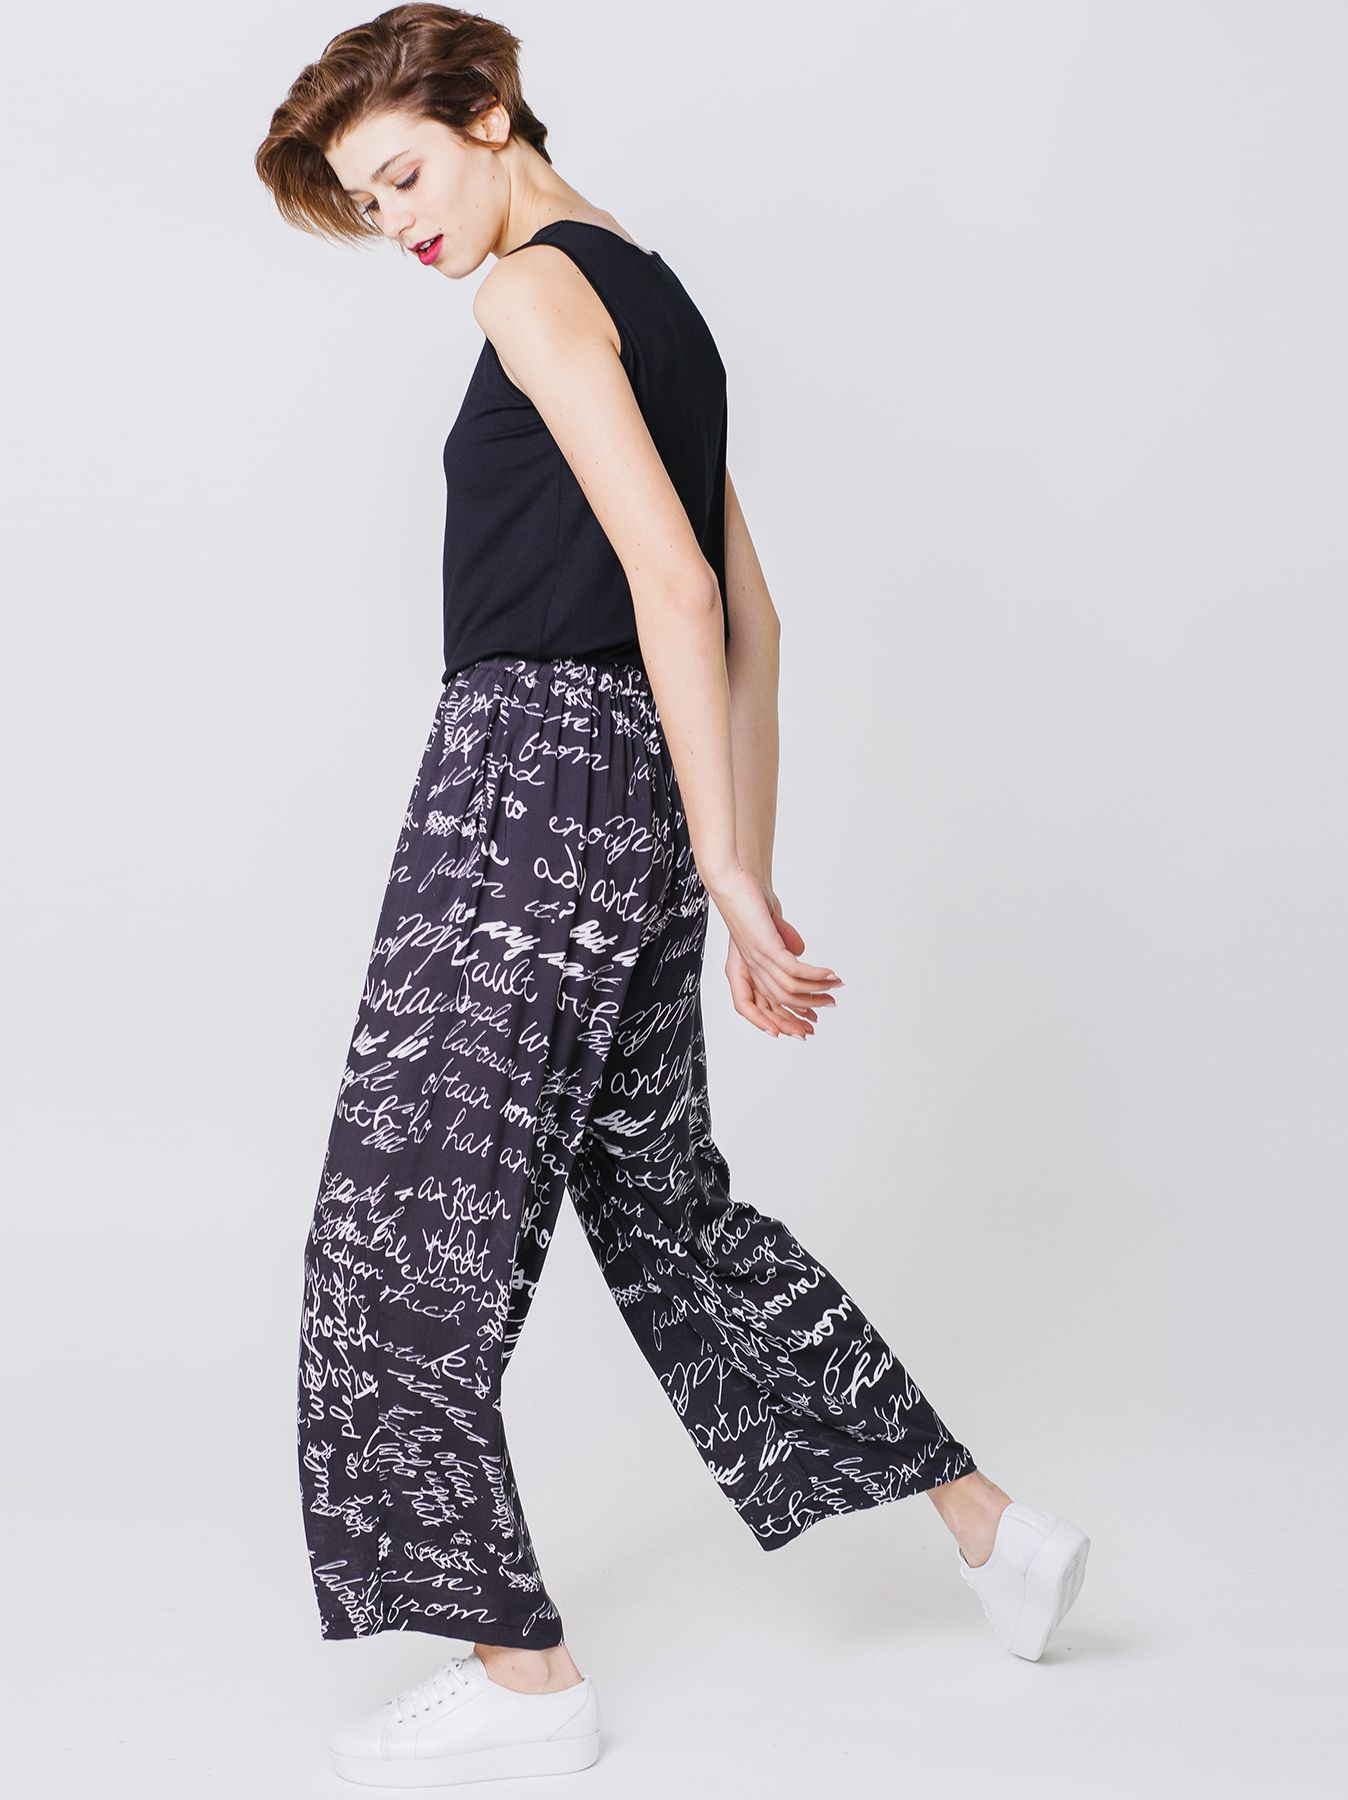 Pantalone gaucho con stampa Graphism